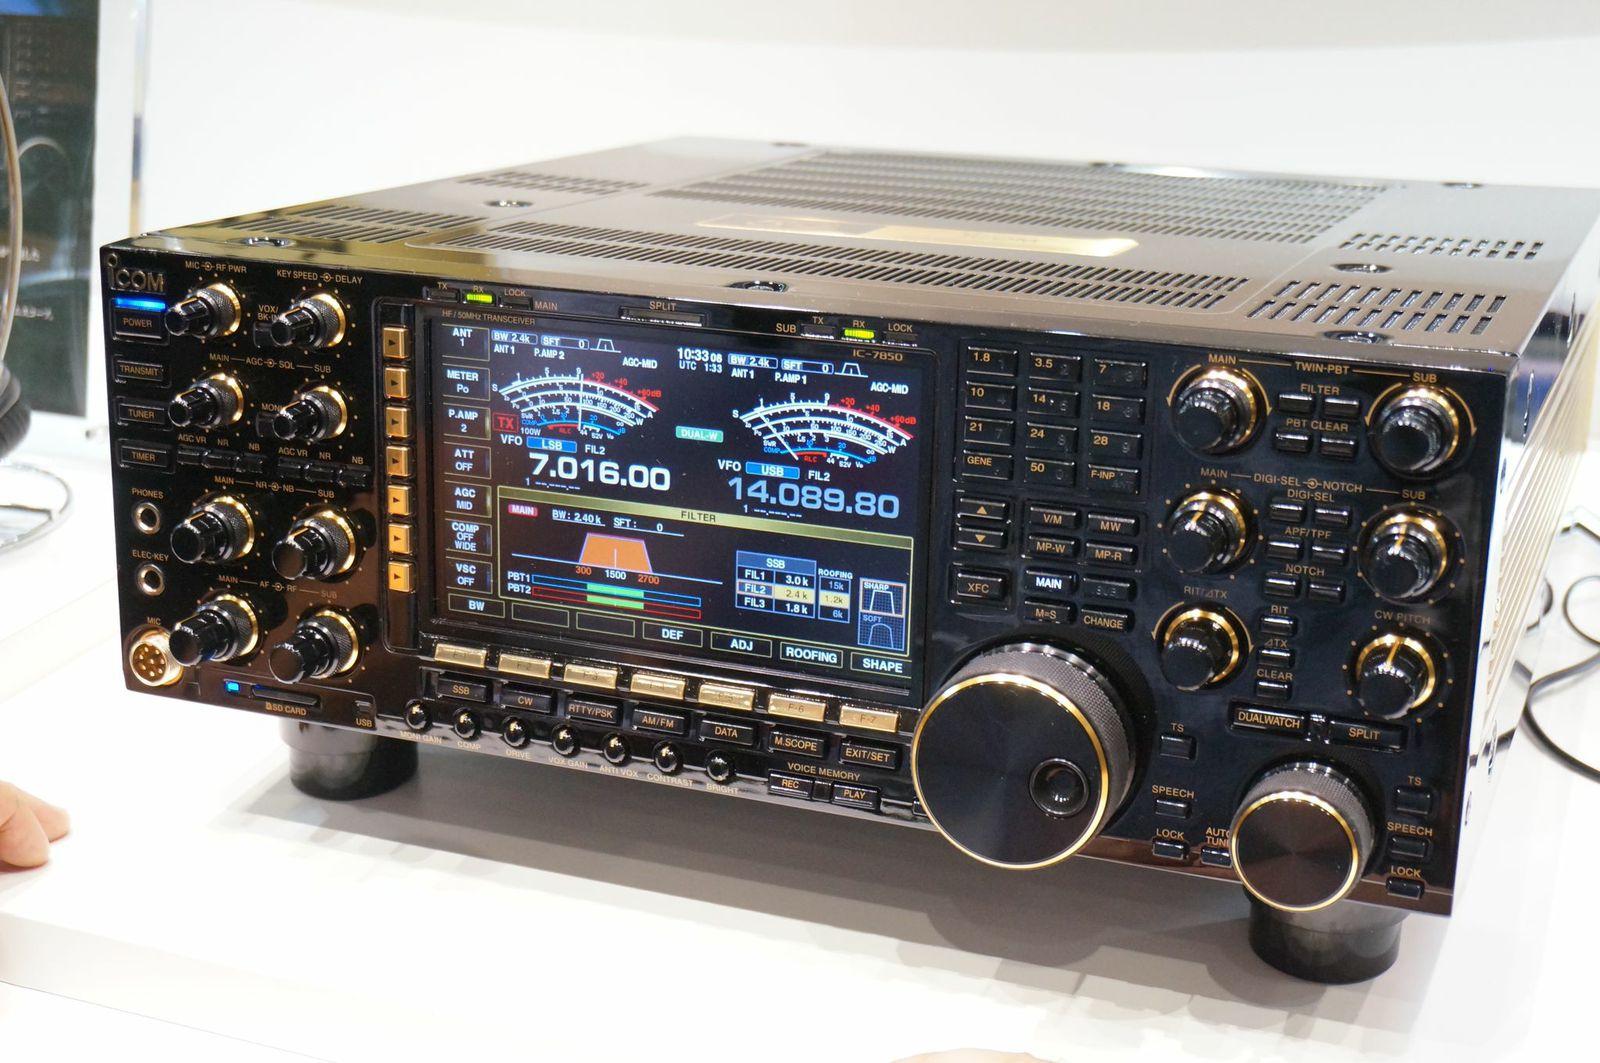 Ic7850